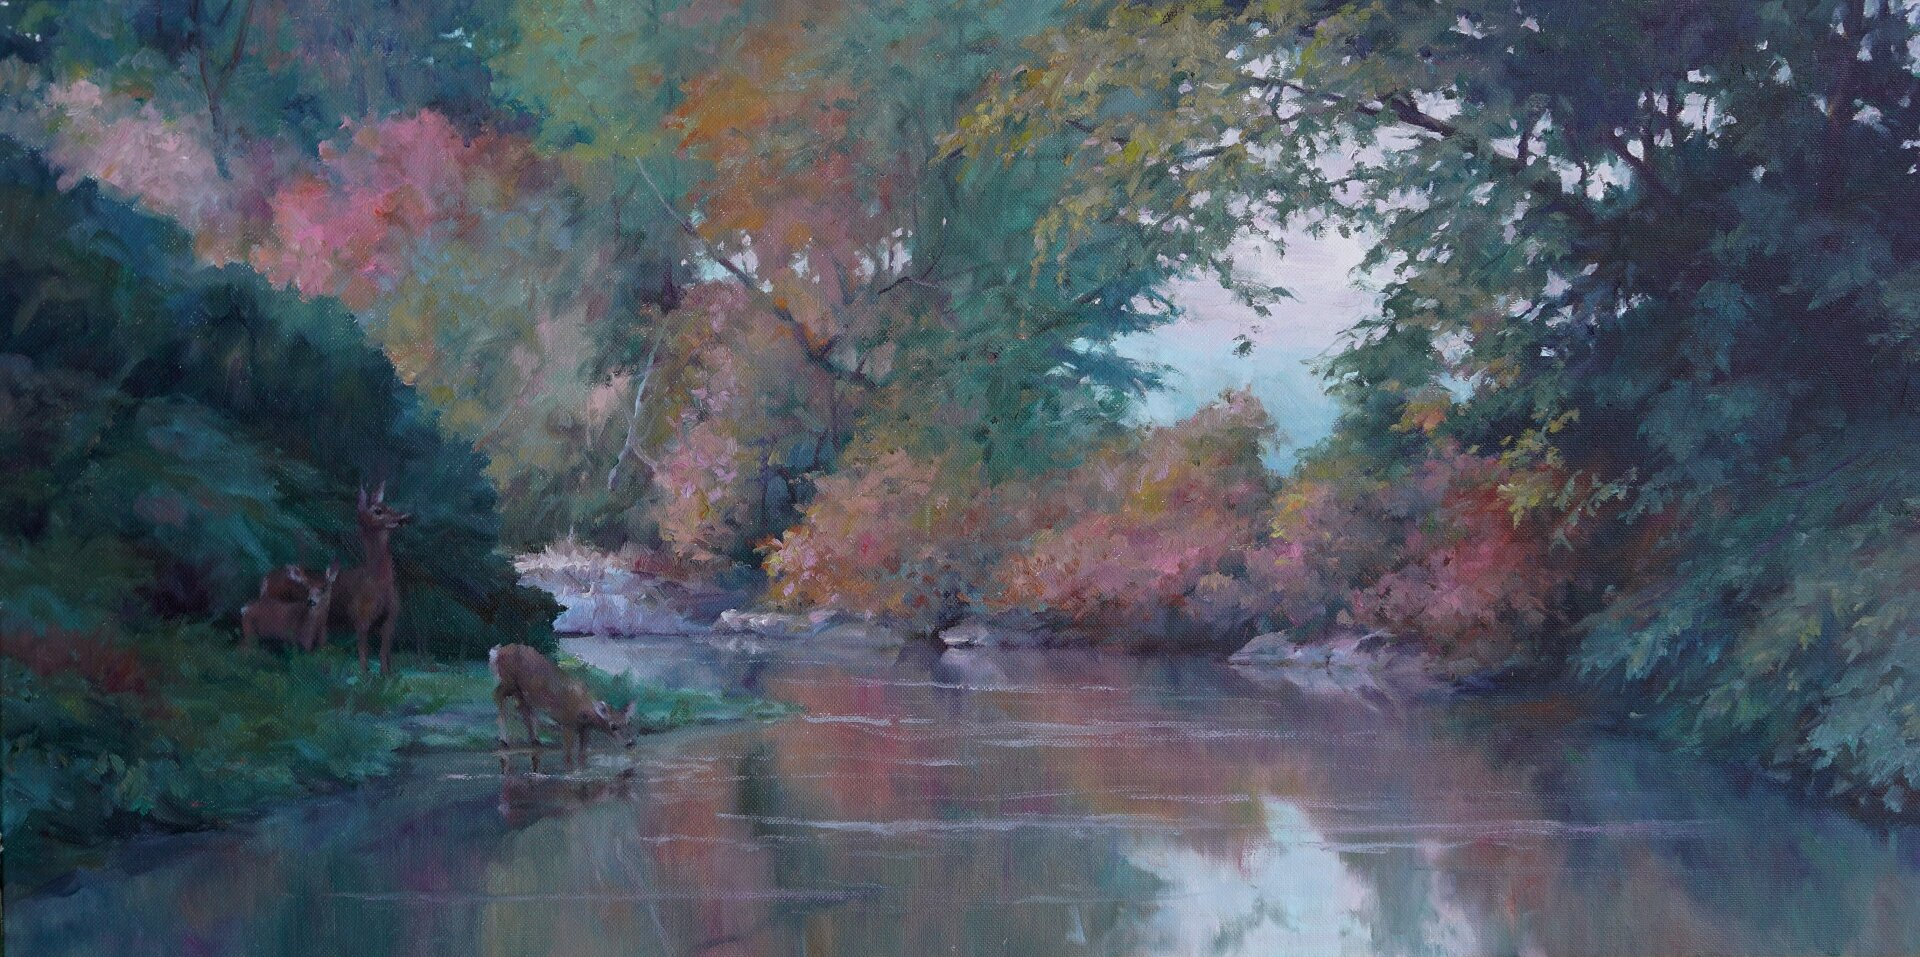 Schoharie Creek Sanctuary 15x30 $4,000